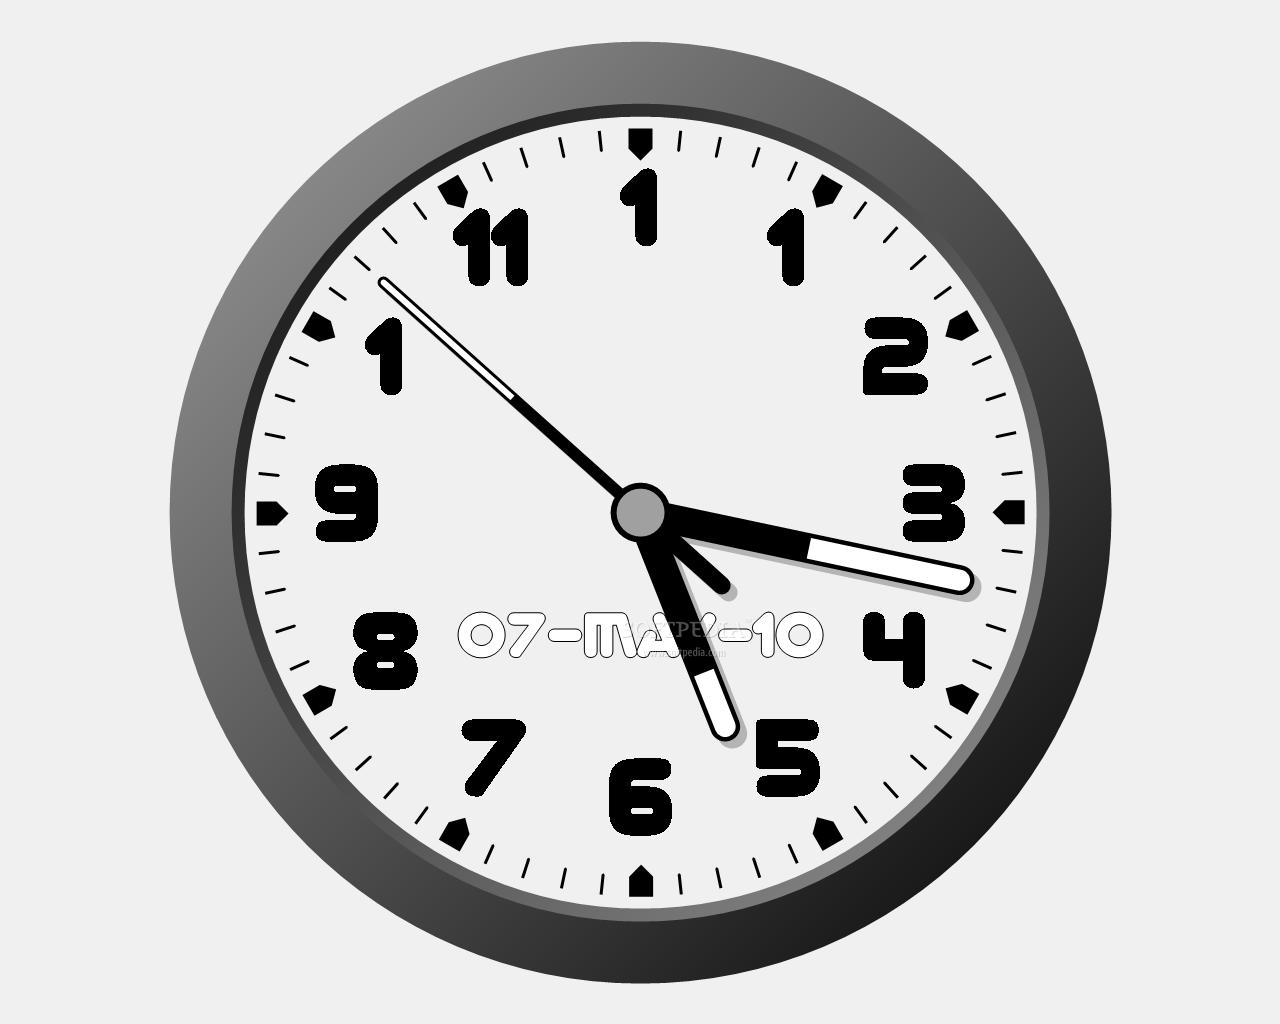 Digital Clock Windows 10 Gadget - Win10Gadgets